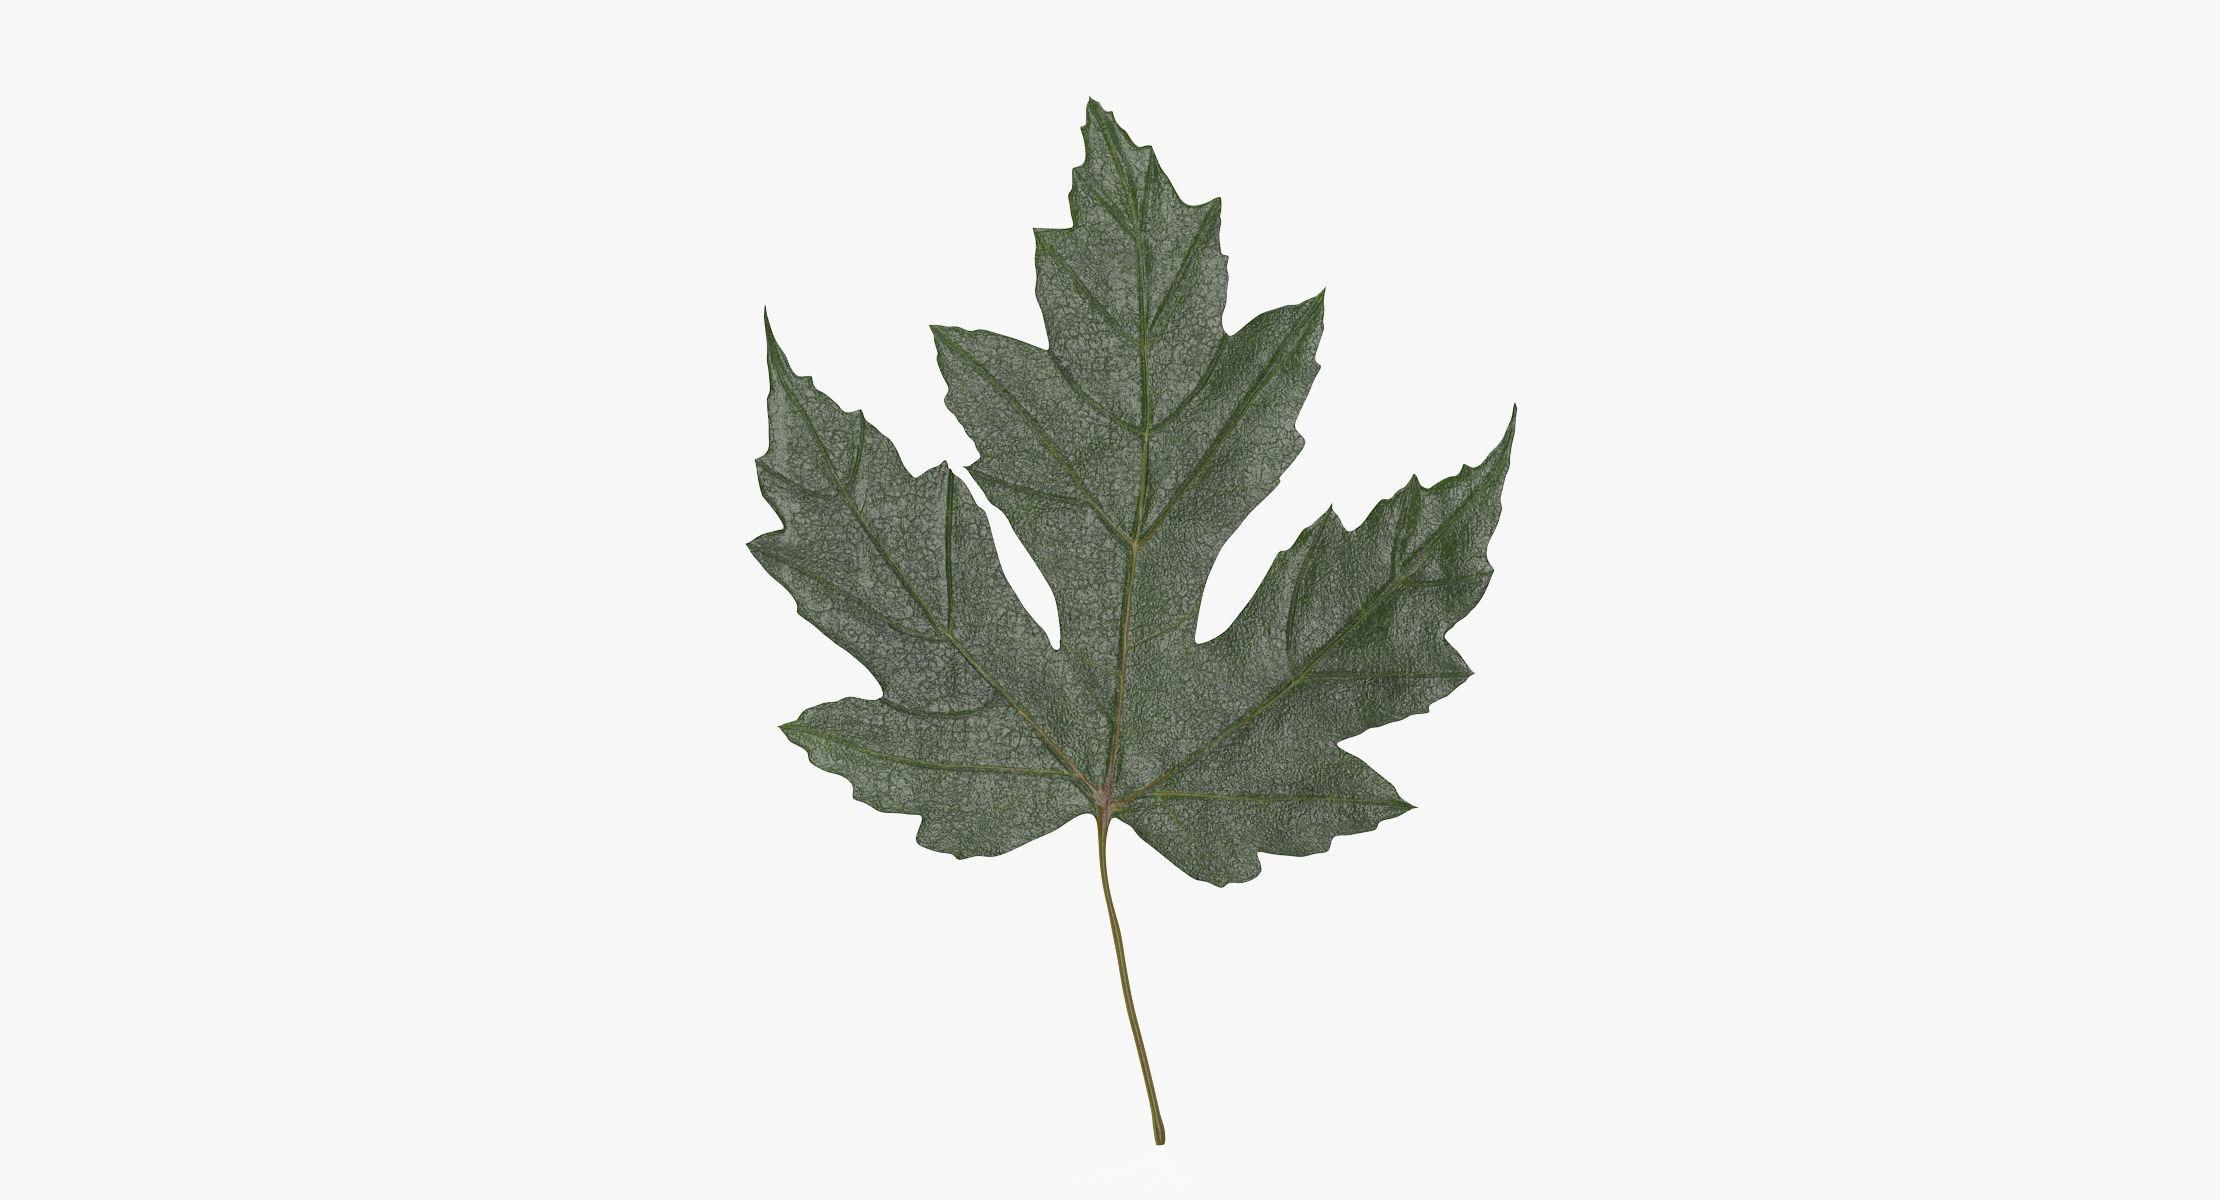 Maple Leaf 01 Green - reel 1